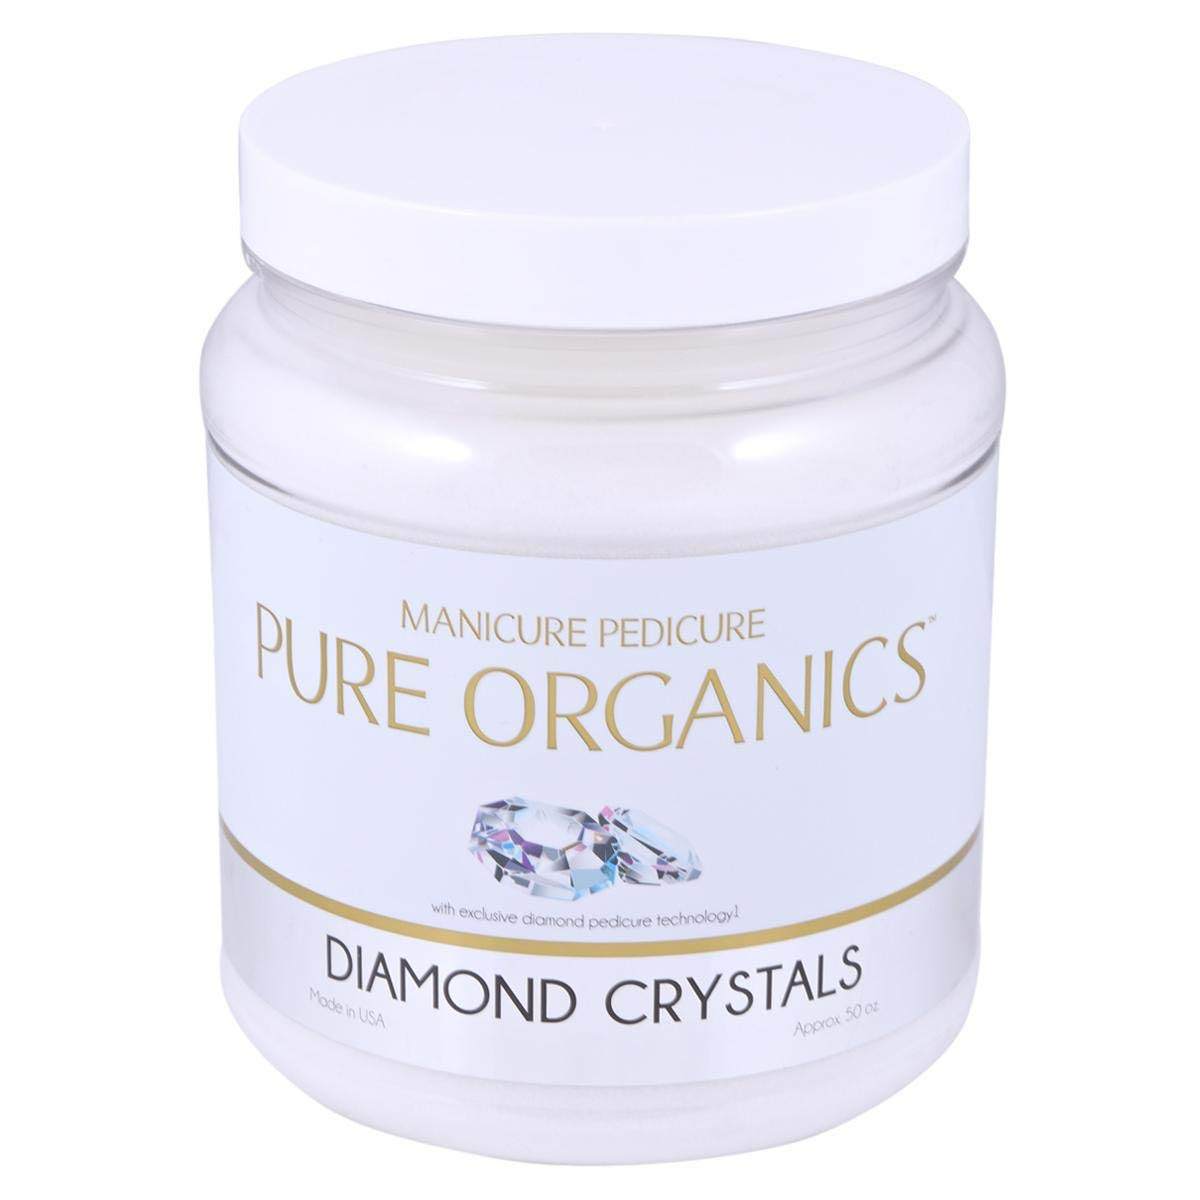 Pure Organics Diamond Pedicure Finally popular brand Rare Spa Crystals